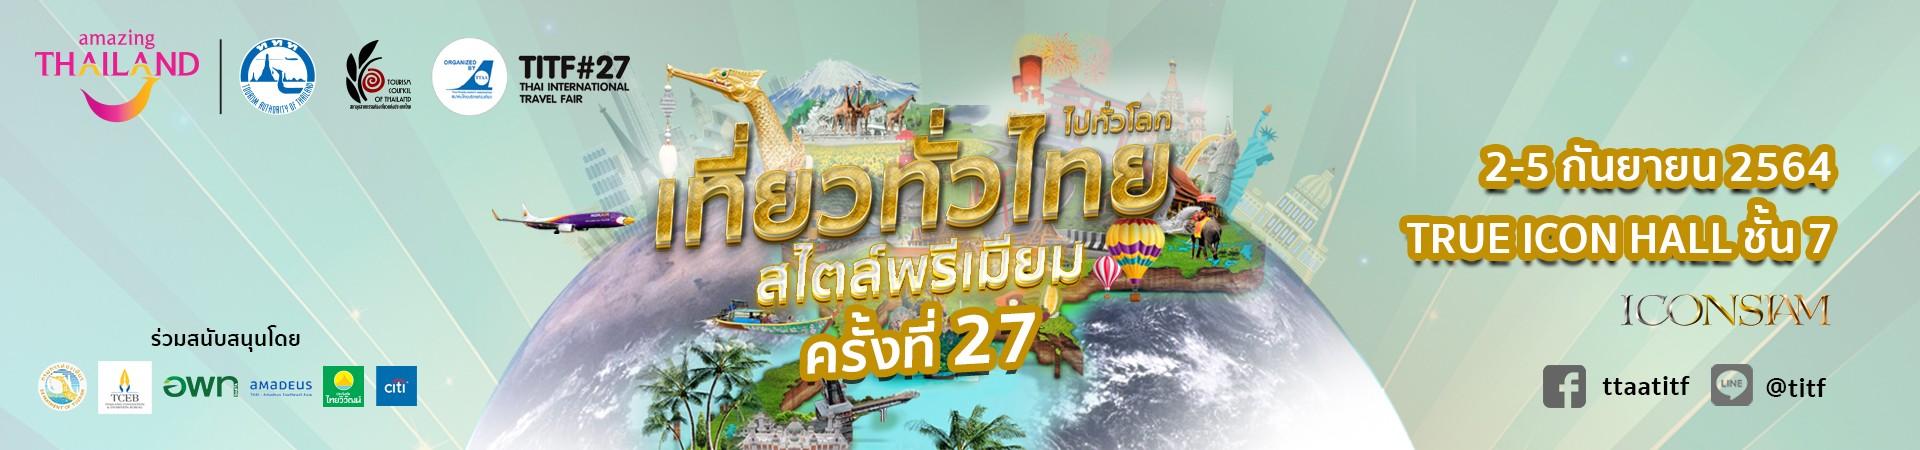 TITF #27タイ国際旅行フェア (Thai International Travel Fair) 最新情報